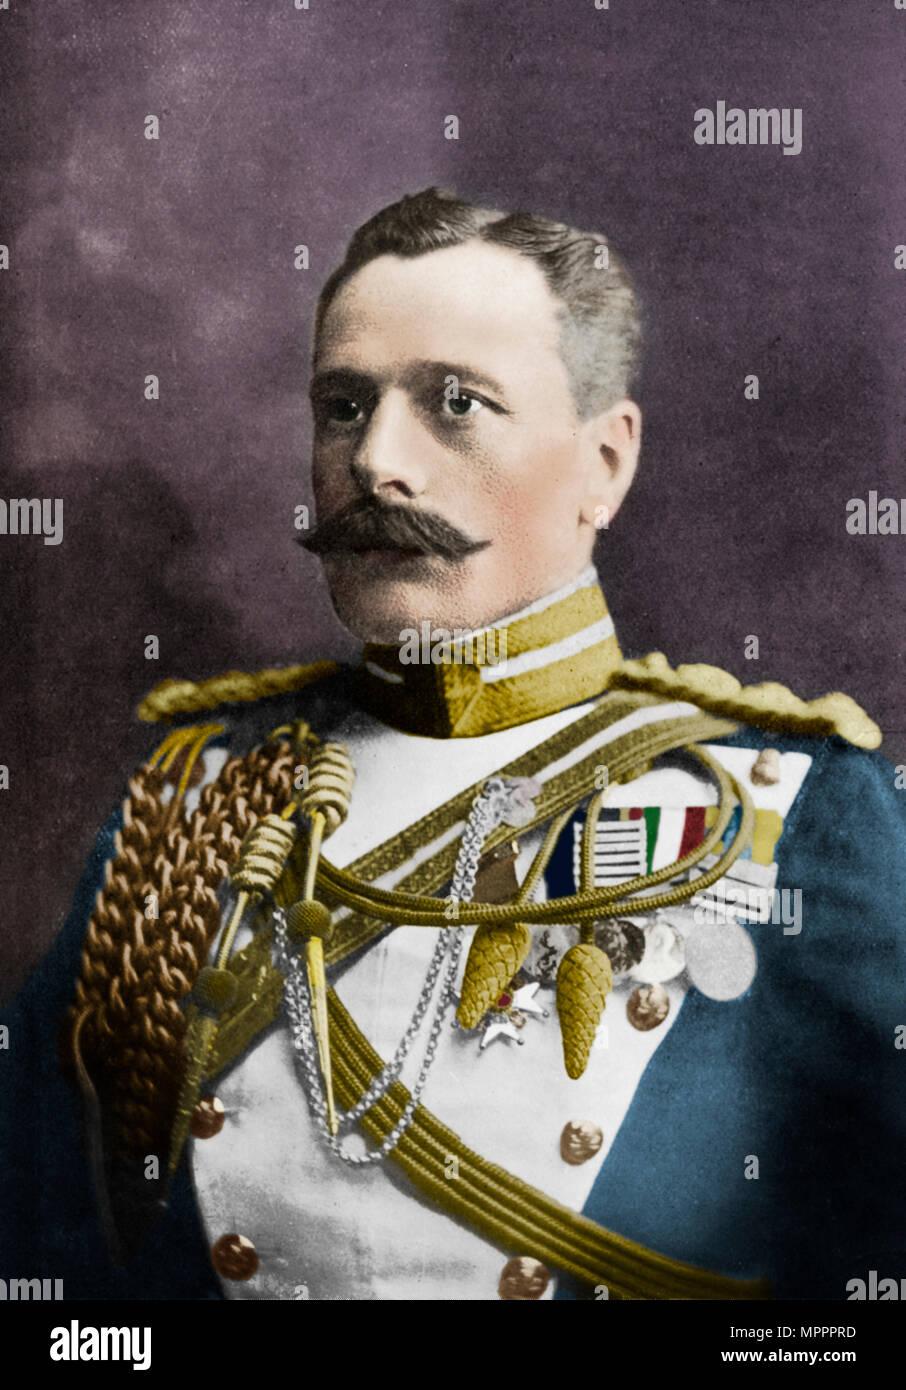 Field Marshal Sir Douglas Haig, British soldier, c1920.  Artist: HW Barnett. - Stock Image